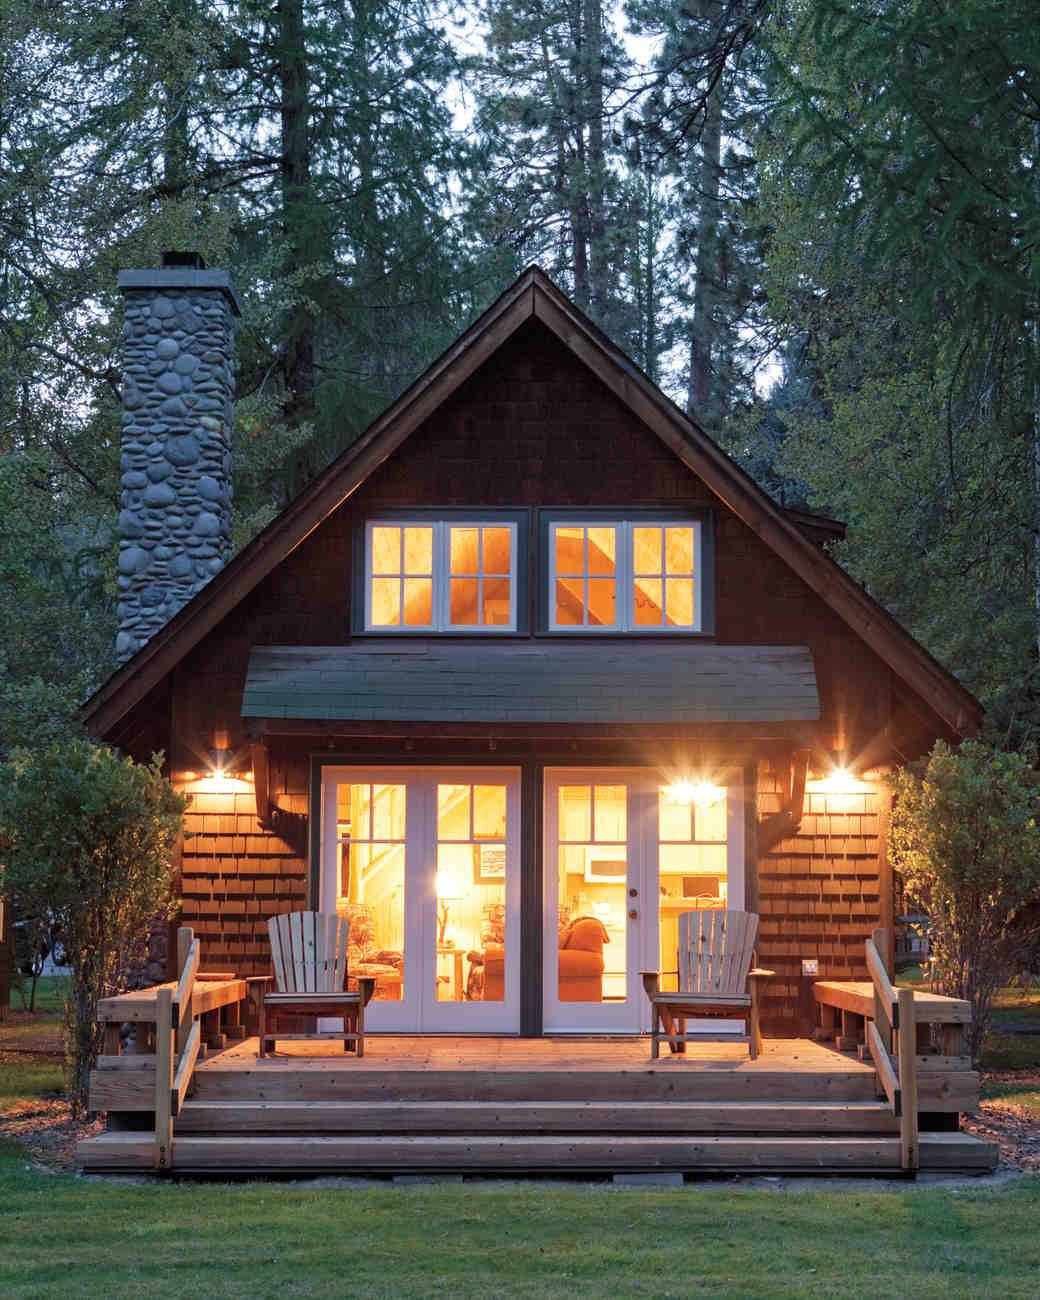 metolius-river-resort-cabin-md108103.jpg